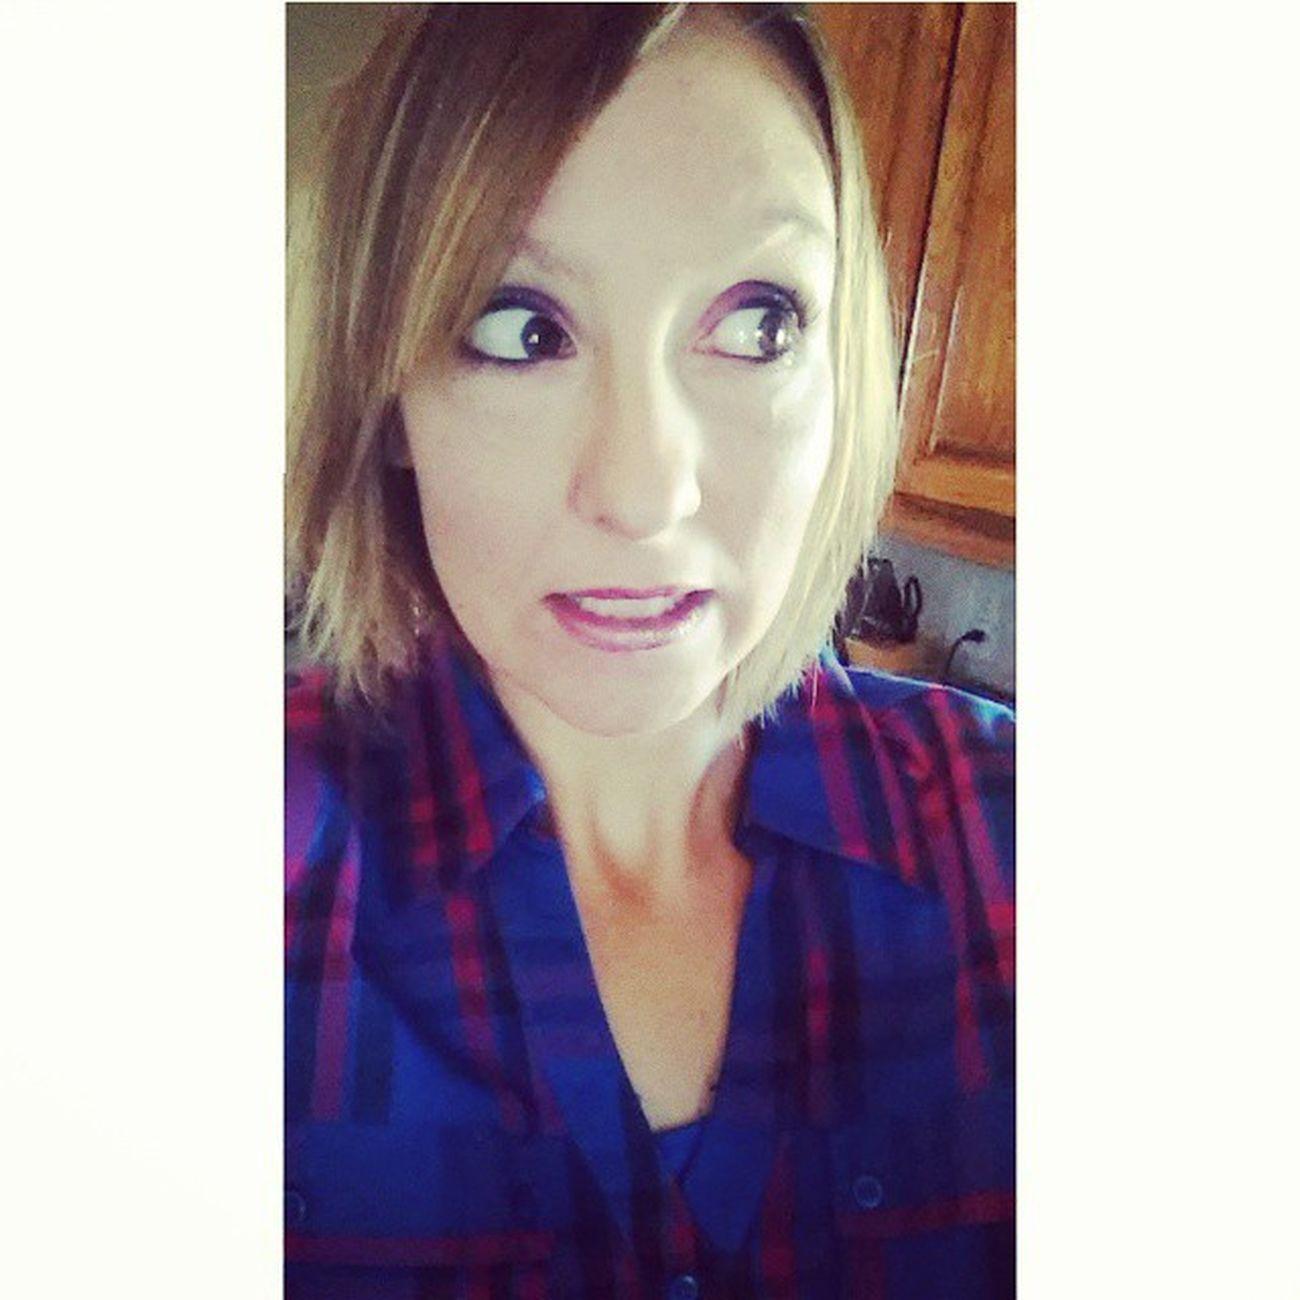 Selfie Selfienation Selfies Tagsforlikes .COM Tflers @TagsForLikes Me Love Pretty Handsome Instagood Instaselfie Selfietime Face Shamelessselefie Life Hair Portrait Igers Fun Followme Instalove Smile IGDaily Eyes Follow